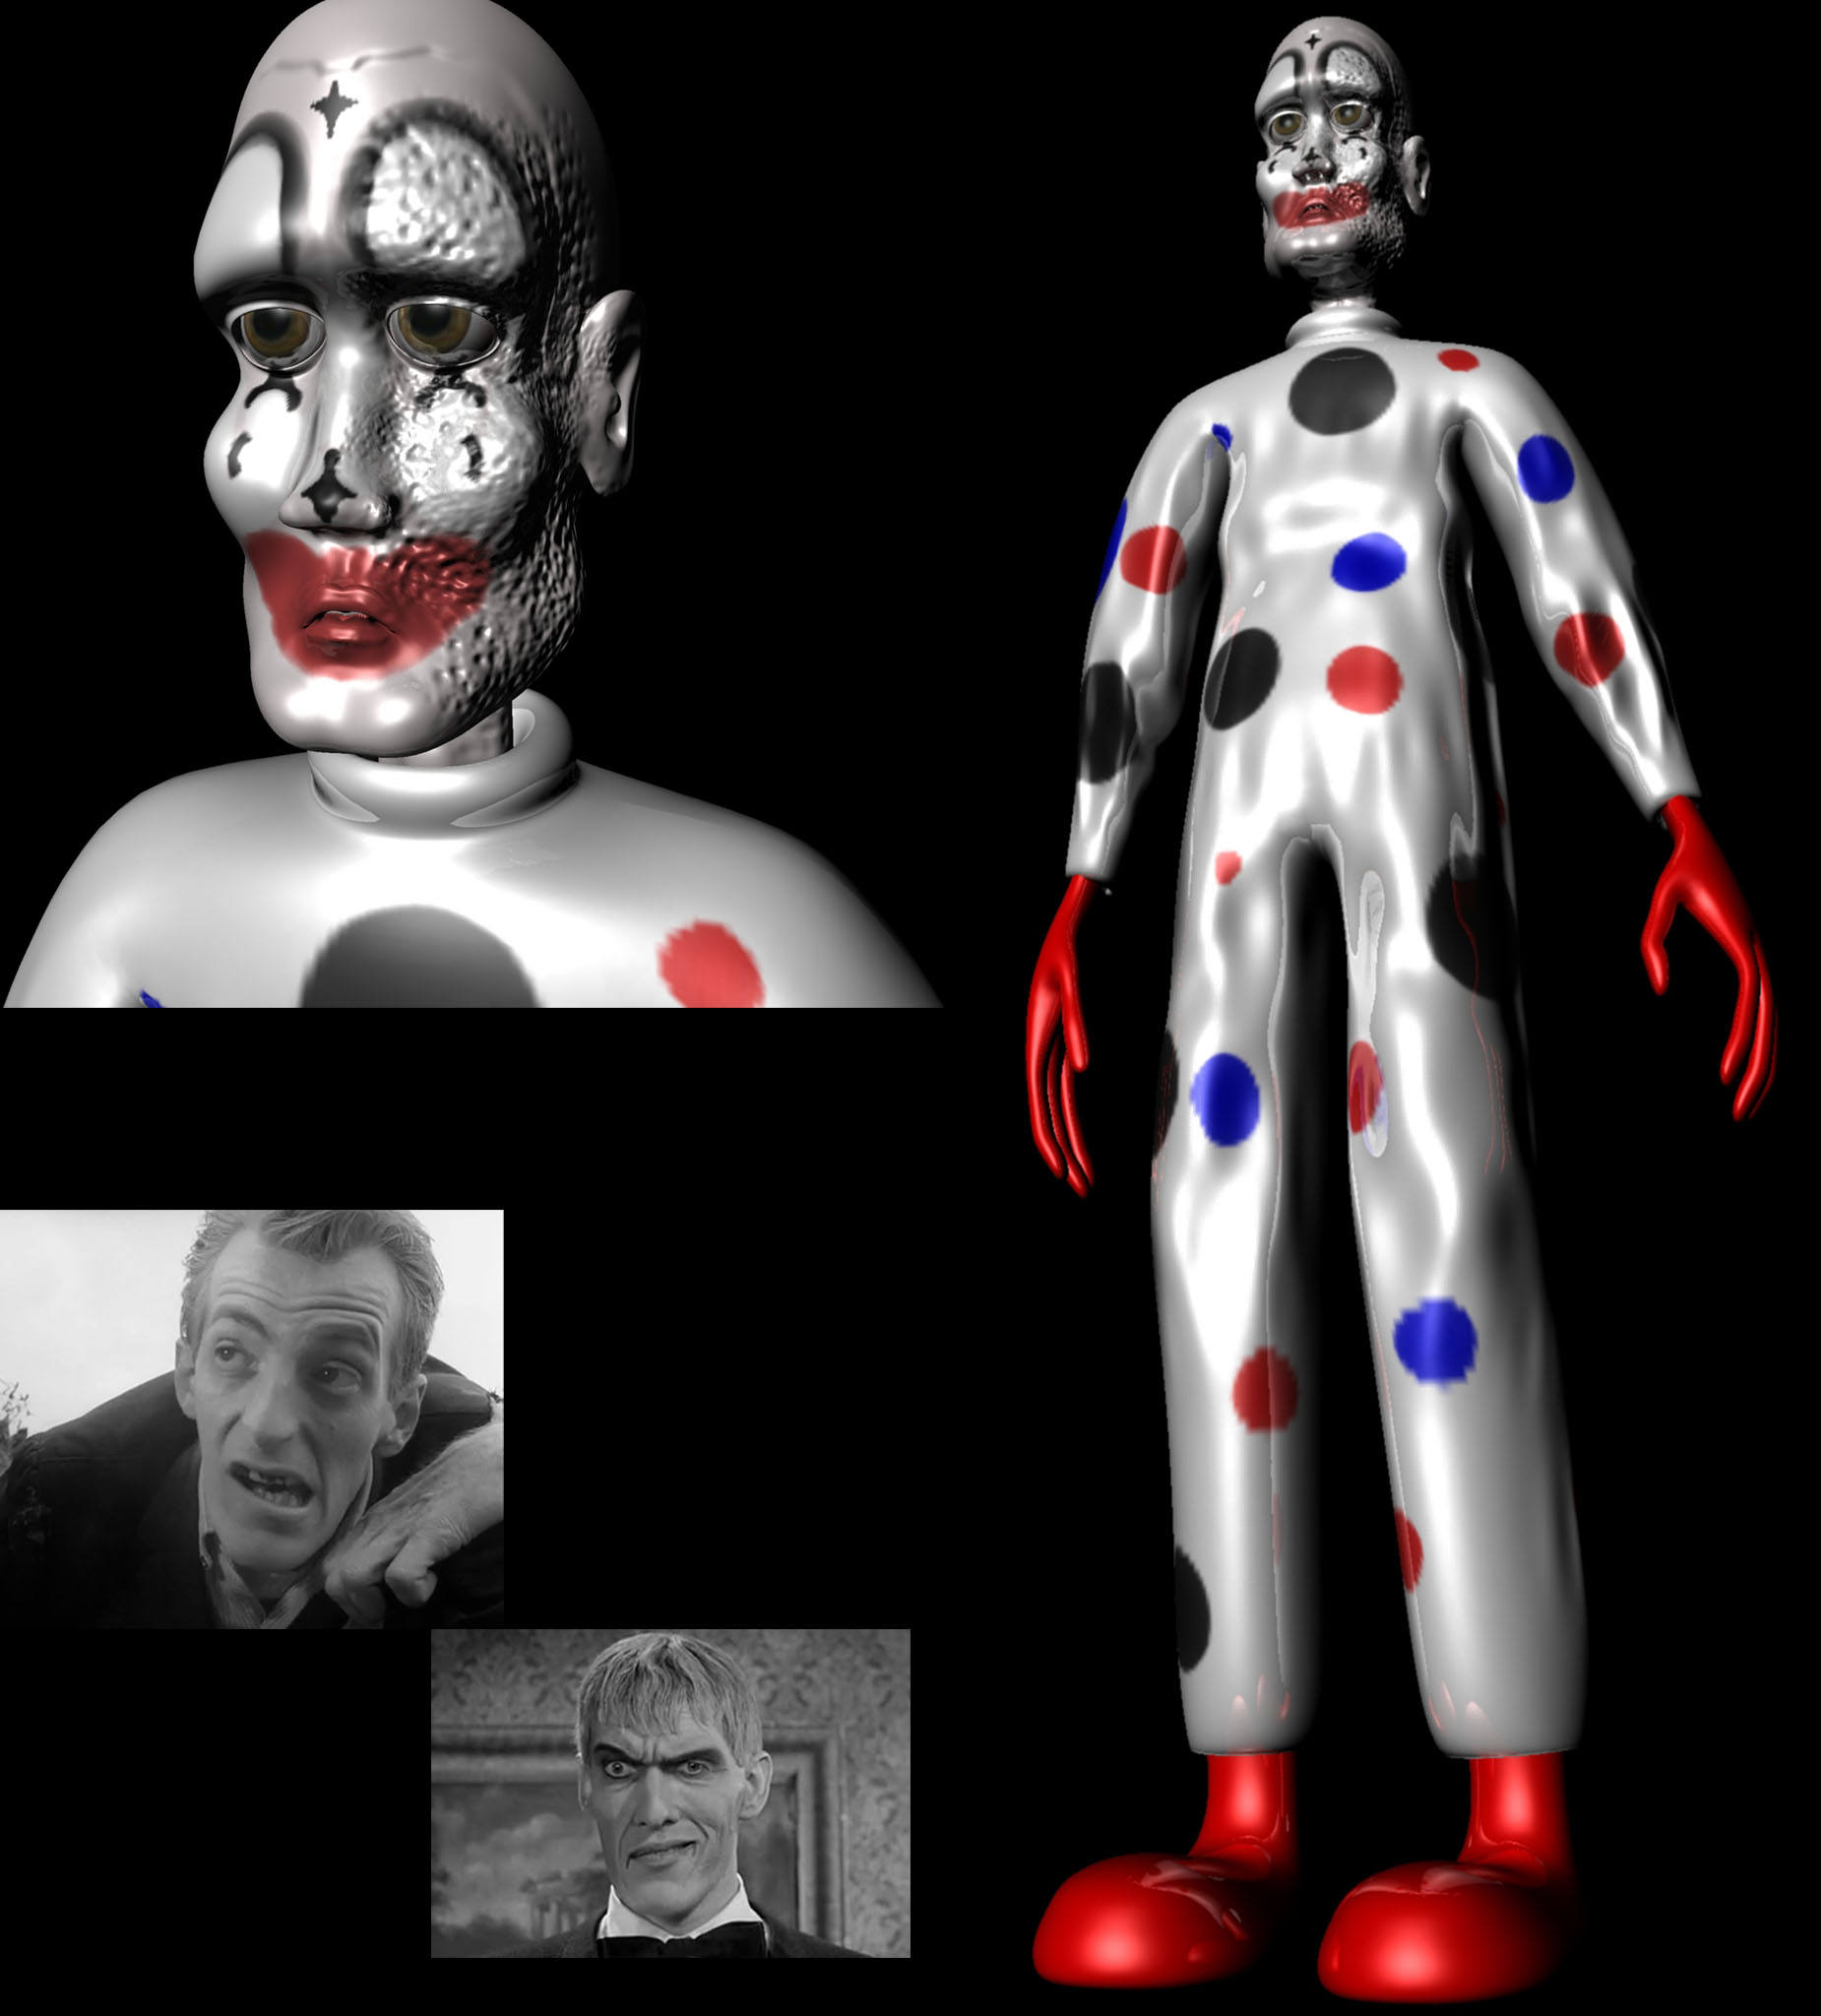 tall_clown_layout_withRefs.jpg